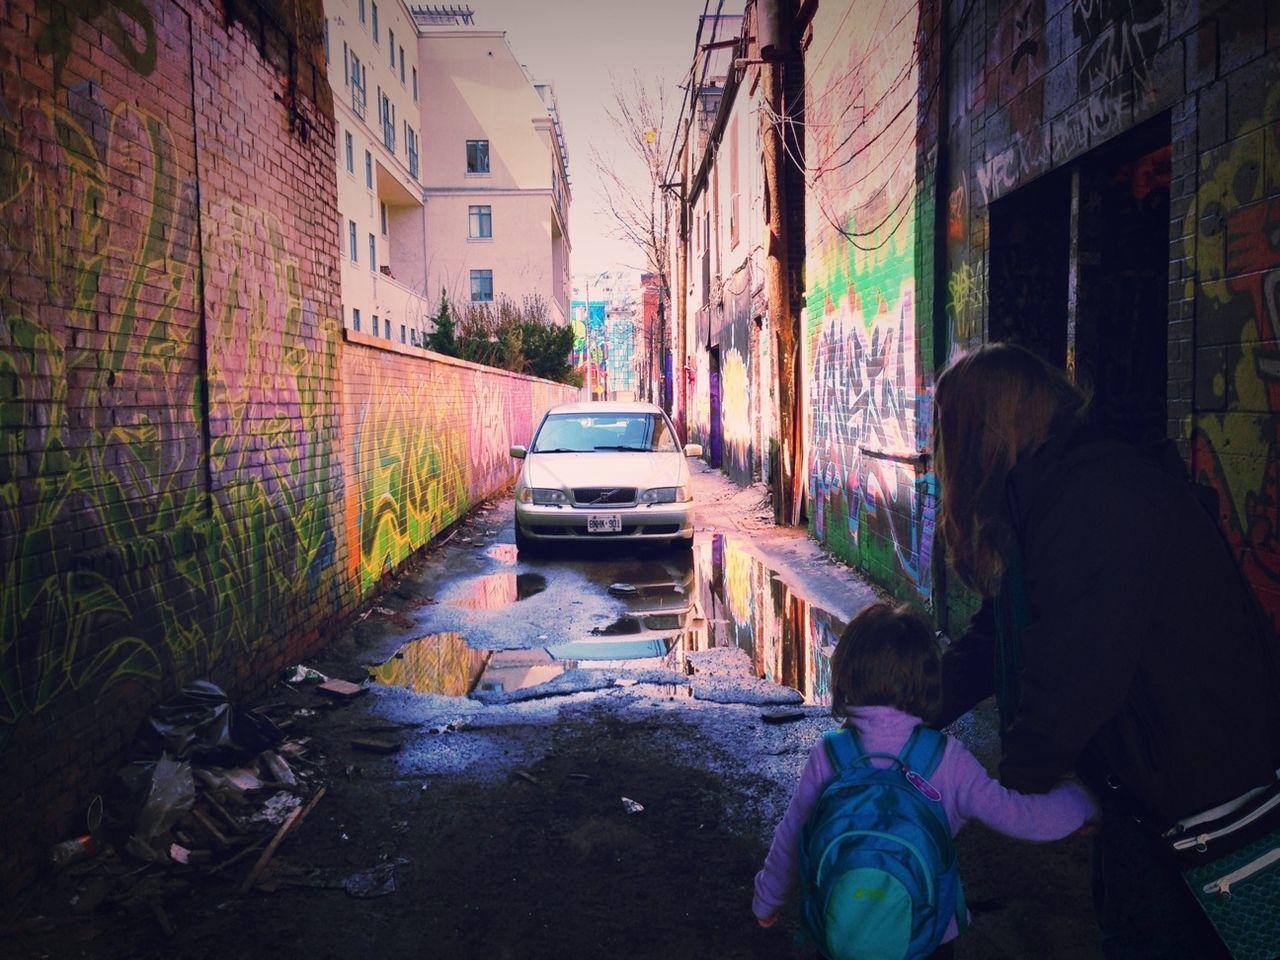 Streetphotography Exploring Backstreets & Alleyways